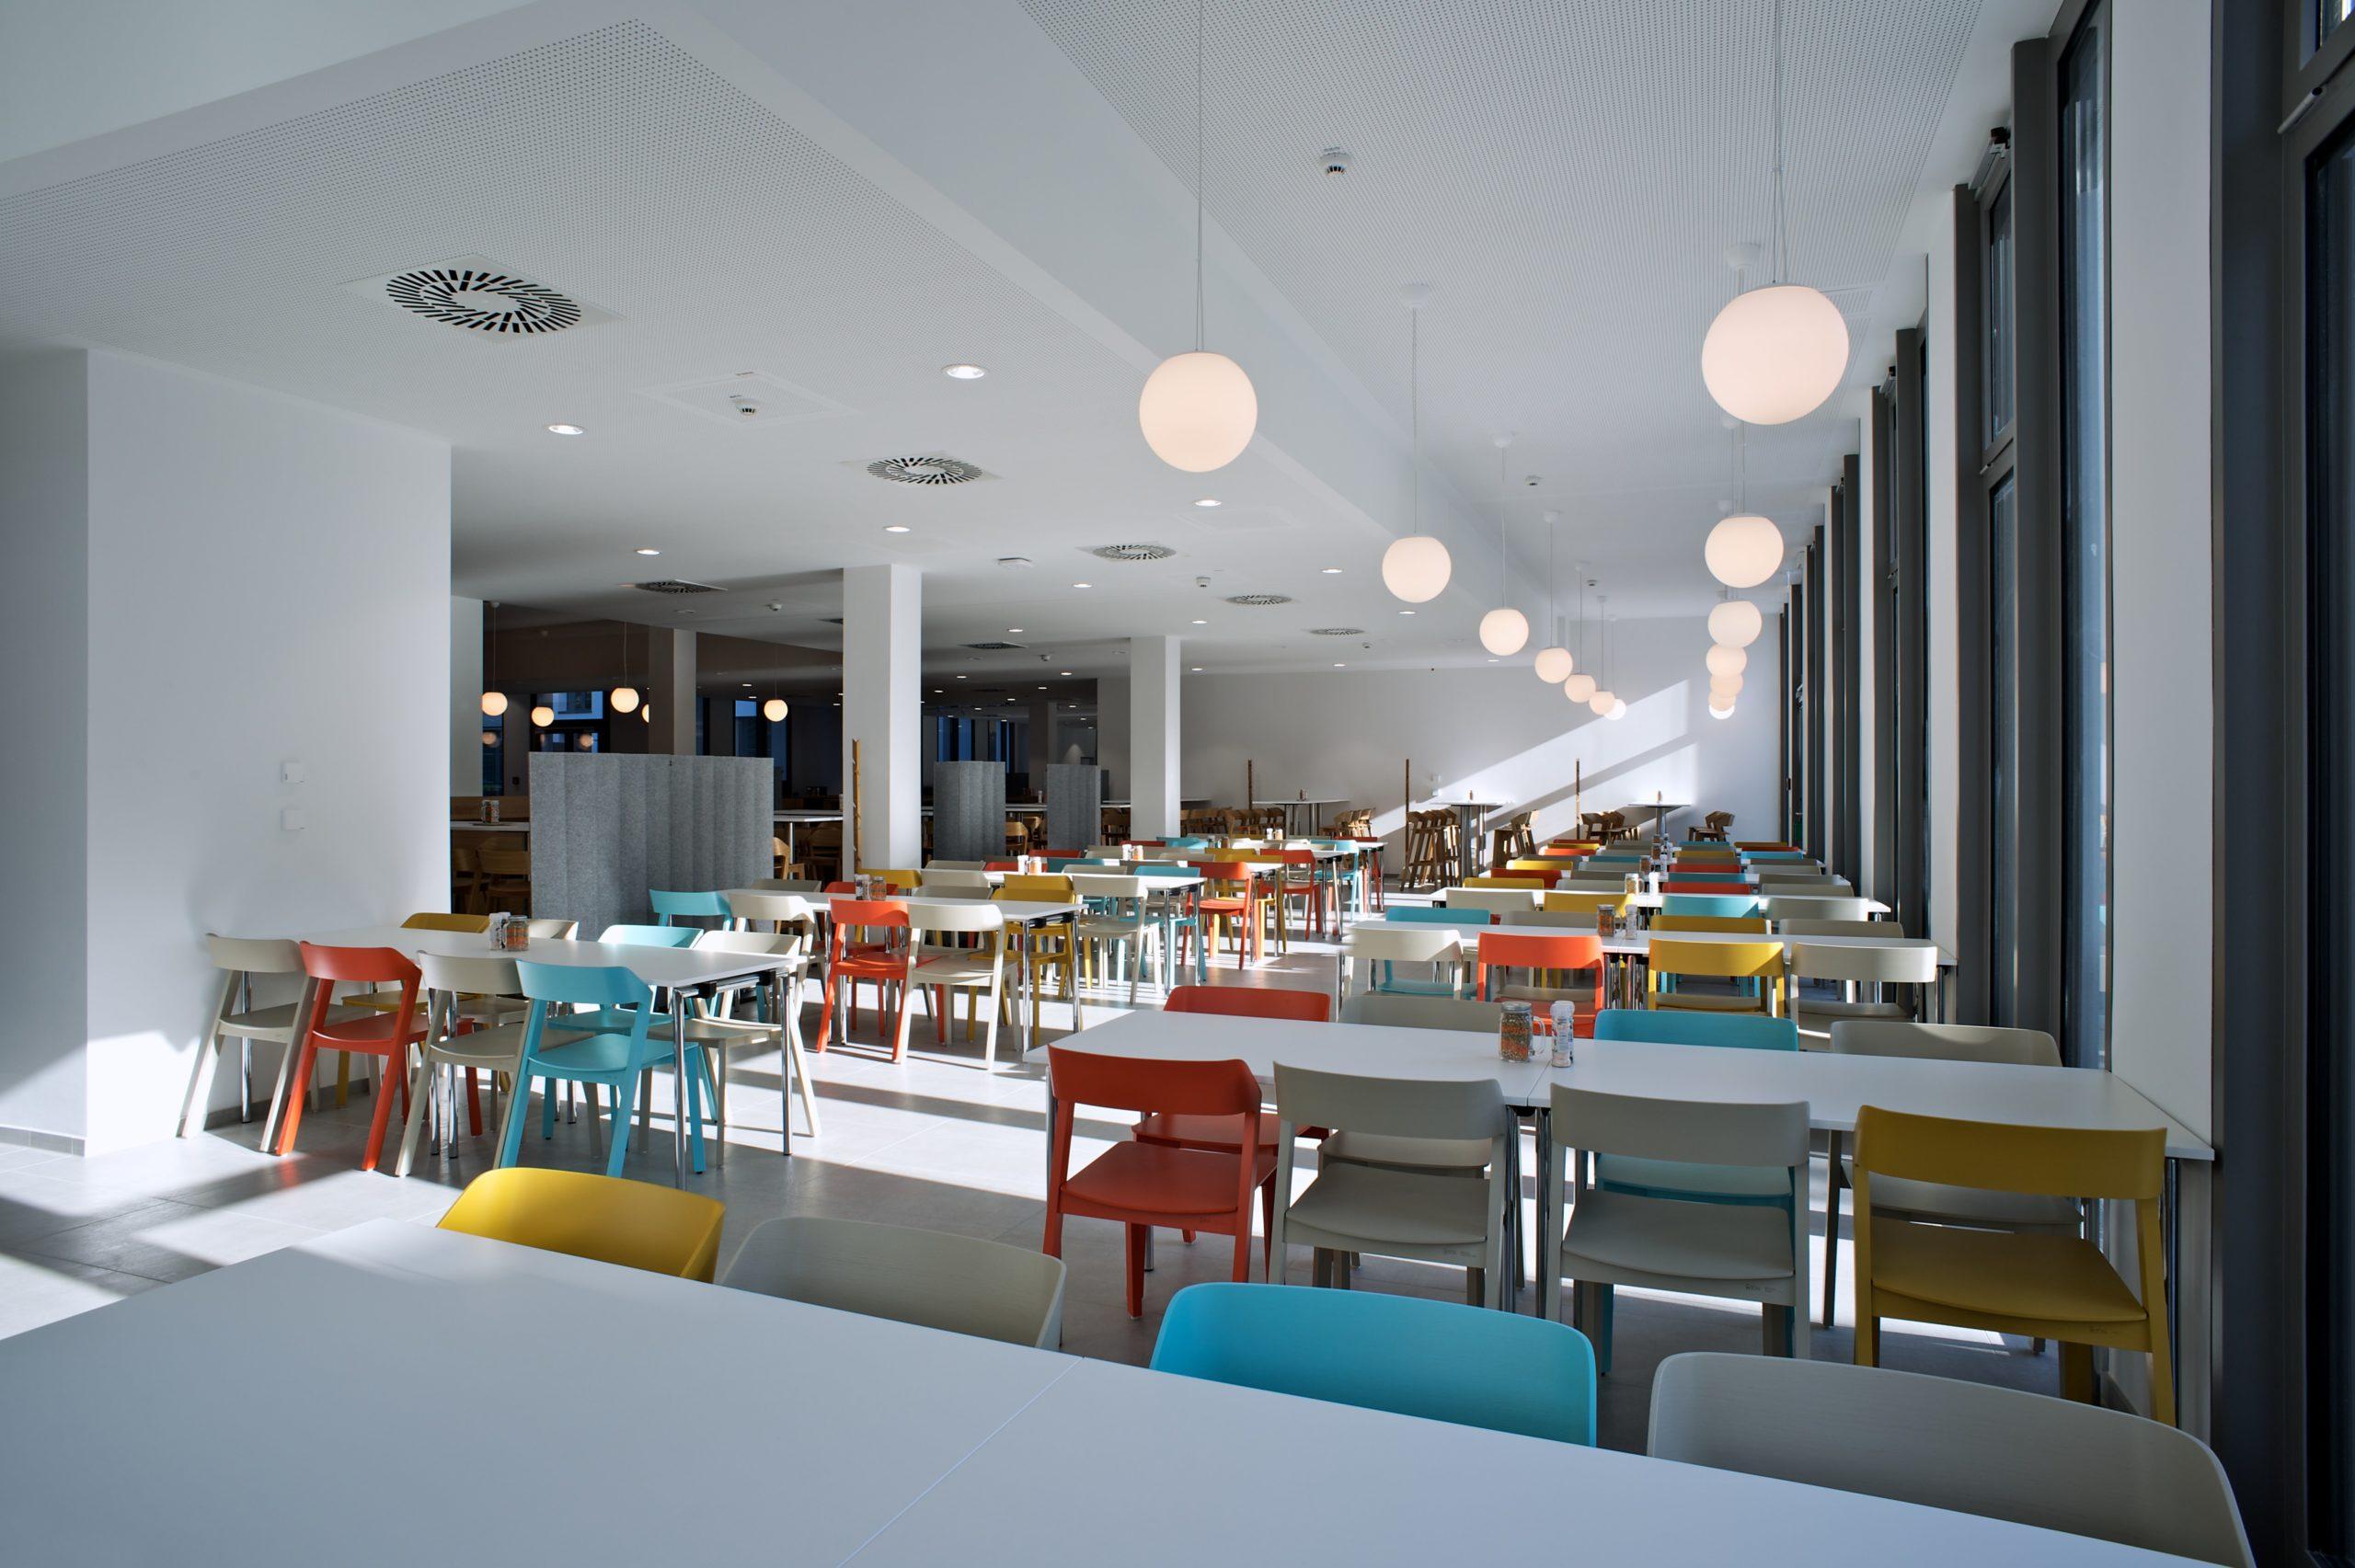 Deutsche Bank Campus (Neubau) Berlin